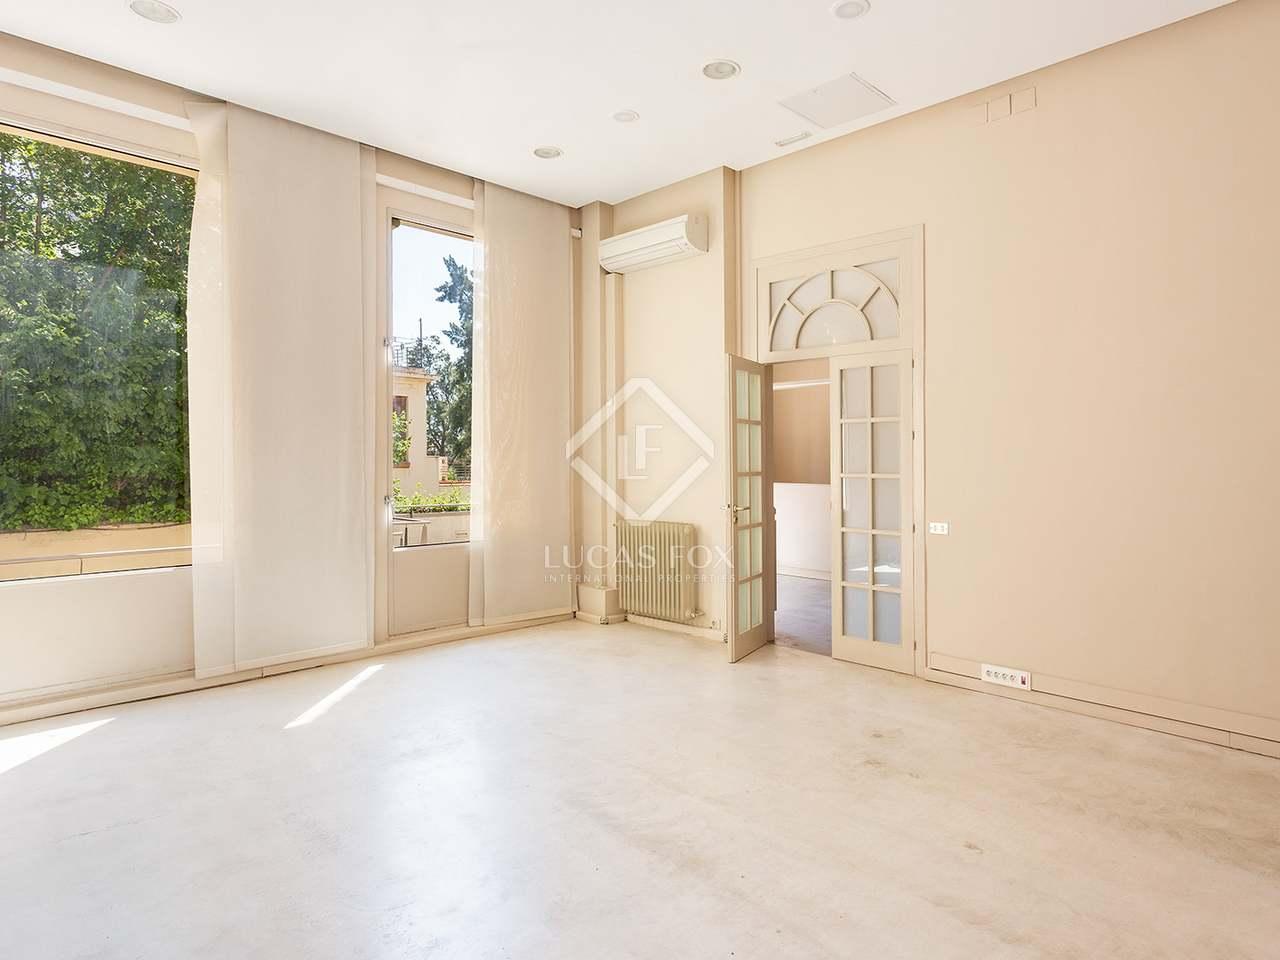 modernista haus zu renovieren in barcelonas zona alta. Black Bedroom Furniture Sets. Home Design Ideas